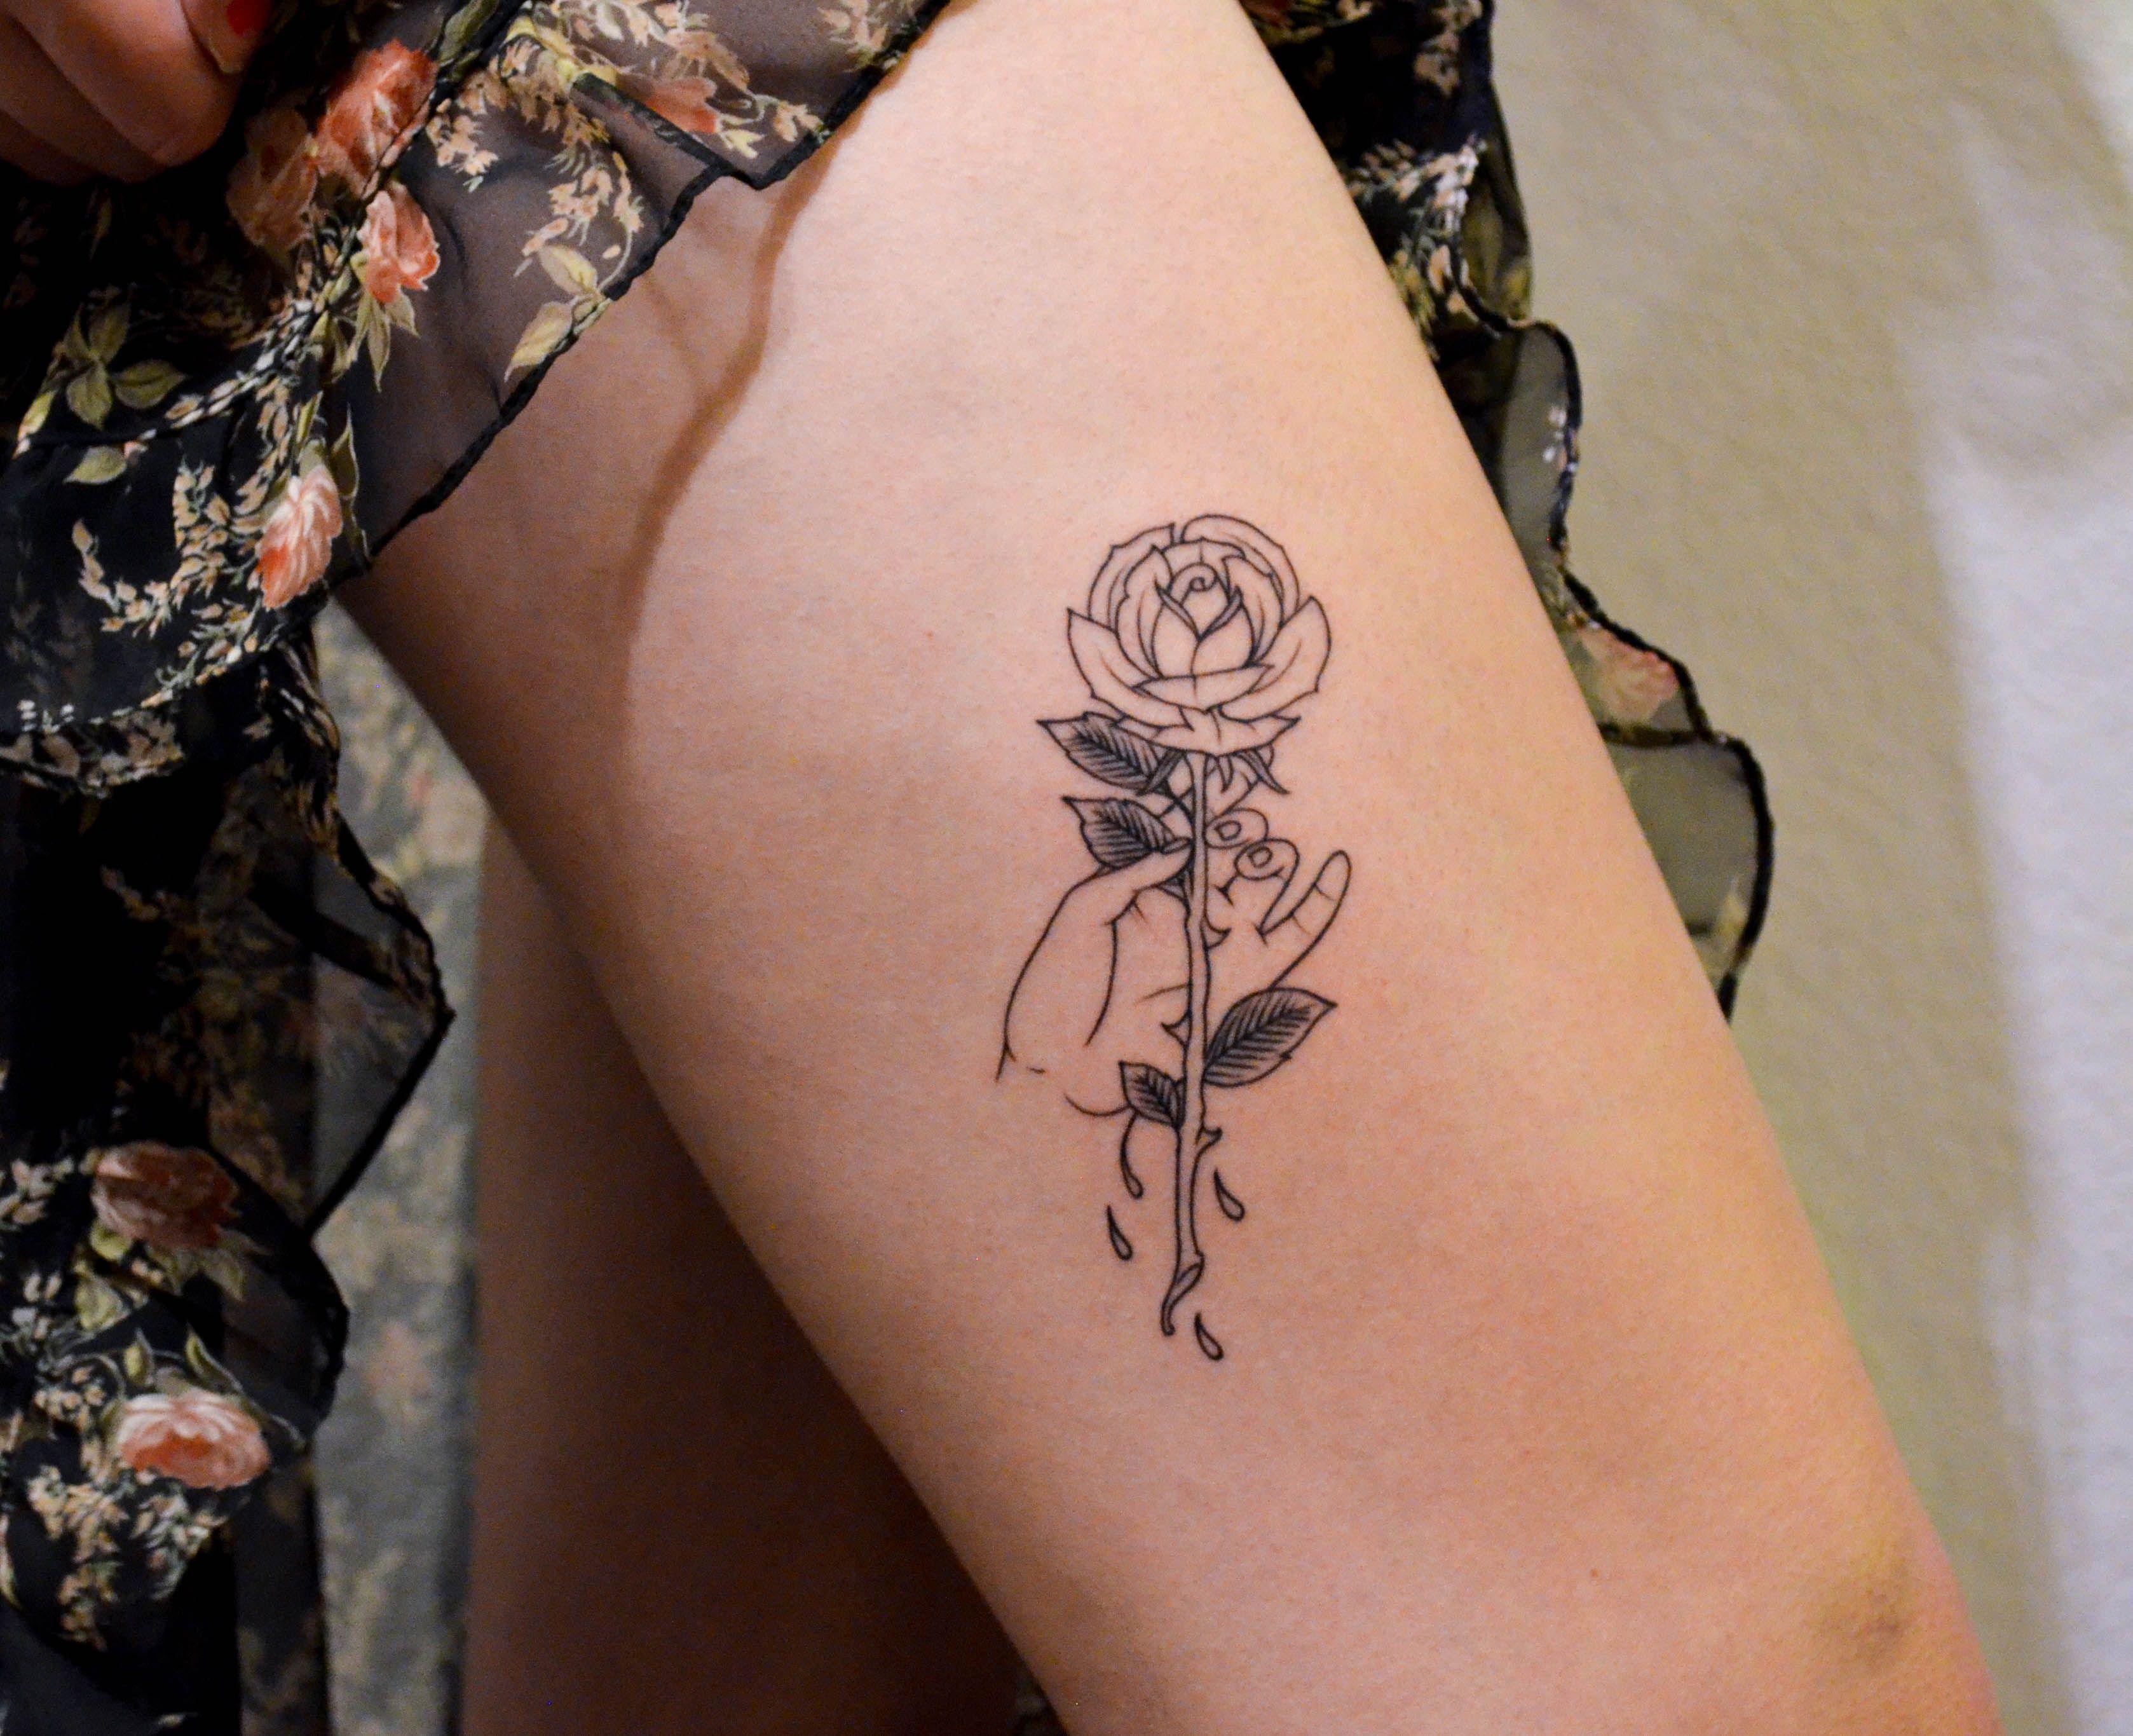 My first tattoo by Adam van Deutekom at Think Tank Tattoo in Denver